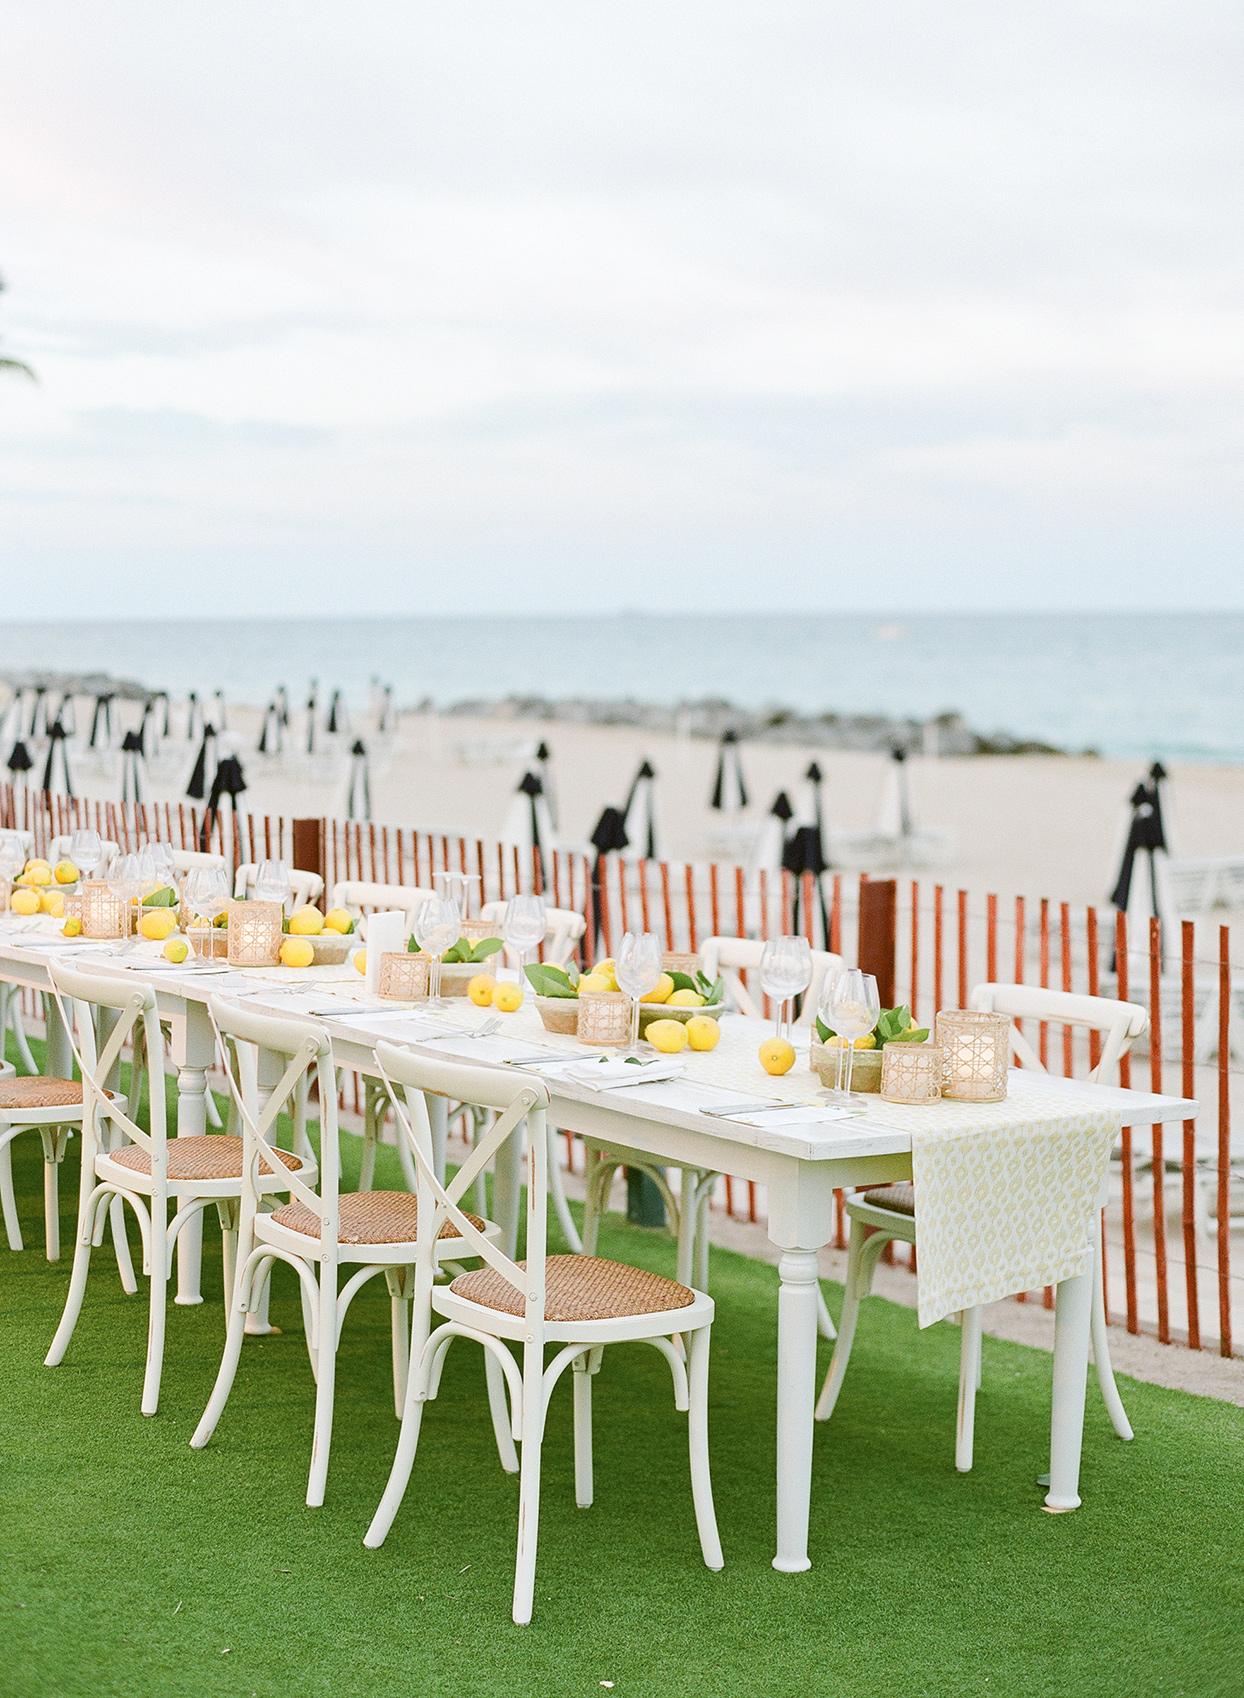 wedding rehearsal dinner table set up by the beach